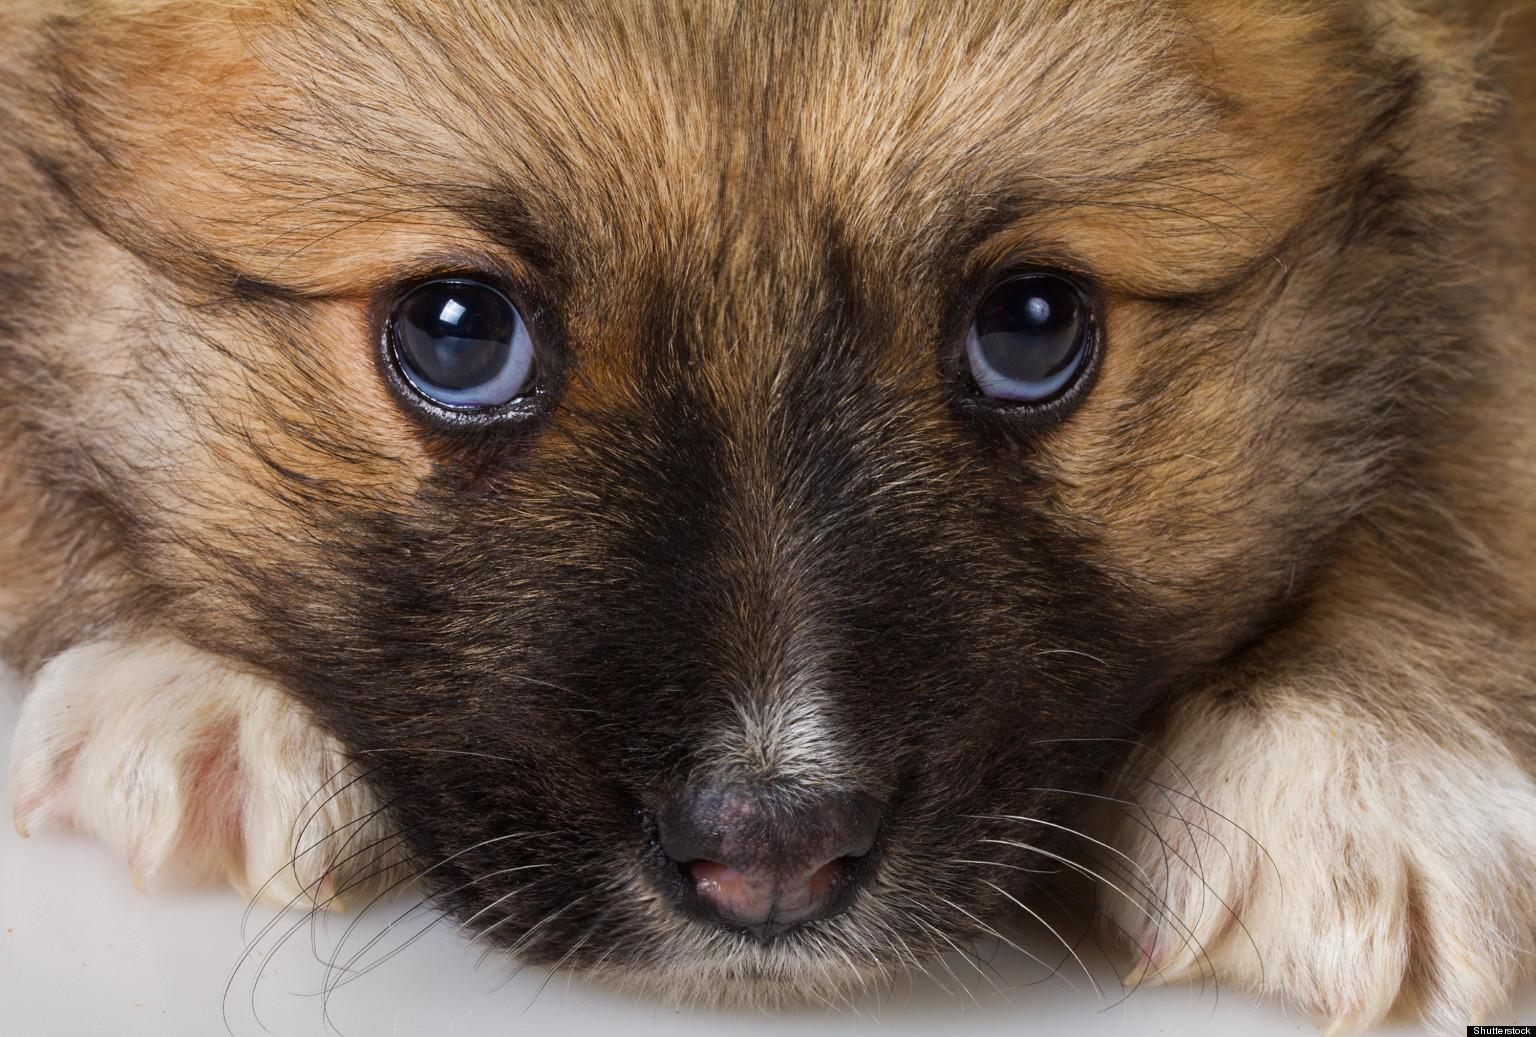 The Scoop on Your Pet's Poop | HuffPost